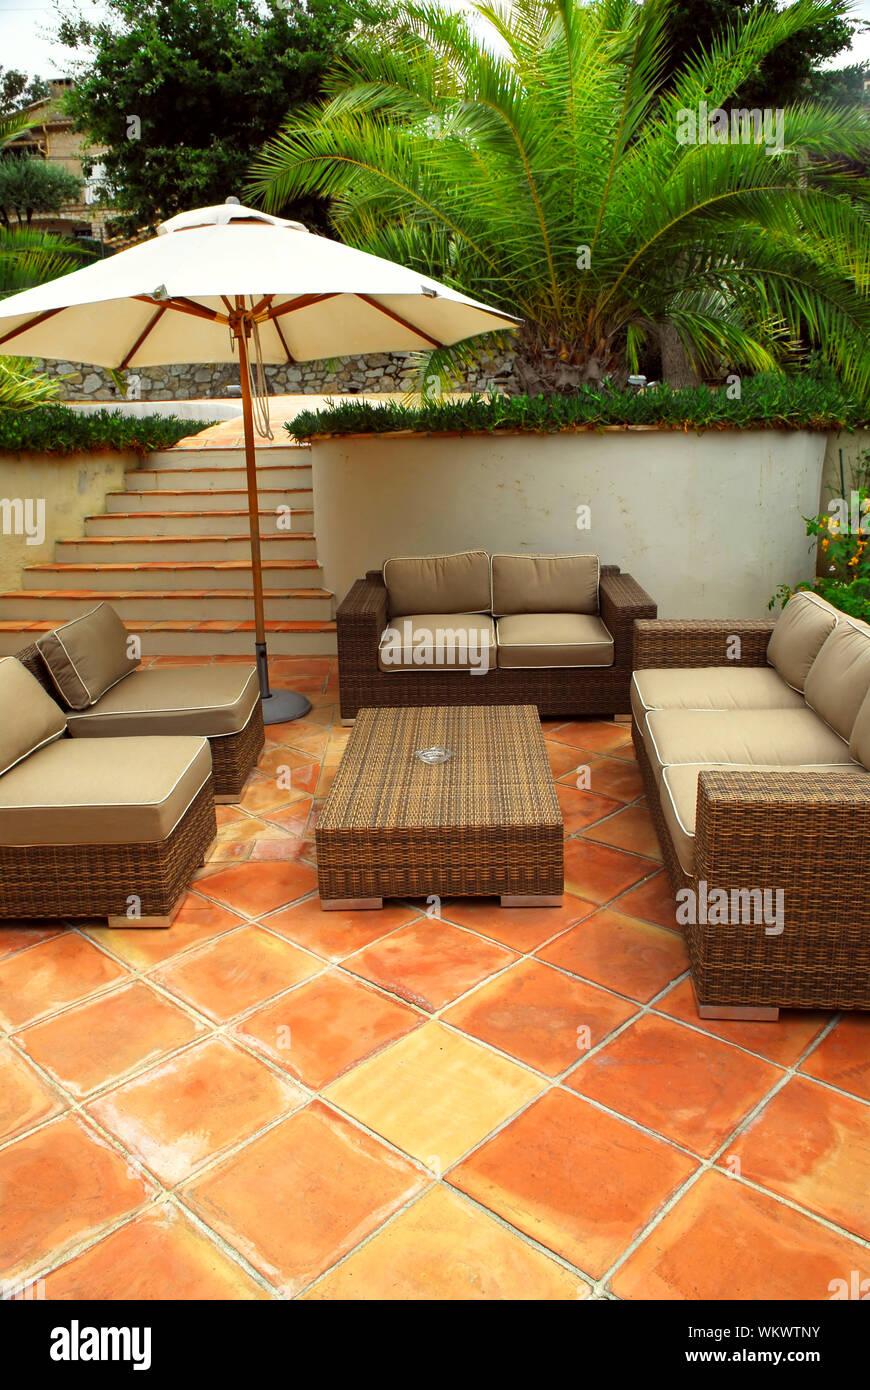 Patio of mediterranean villa in French Riviera with wicker furniture Stock Photo